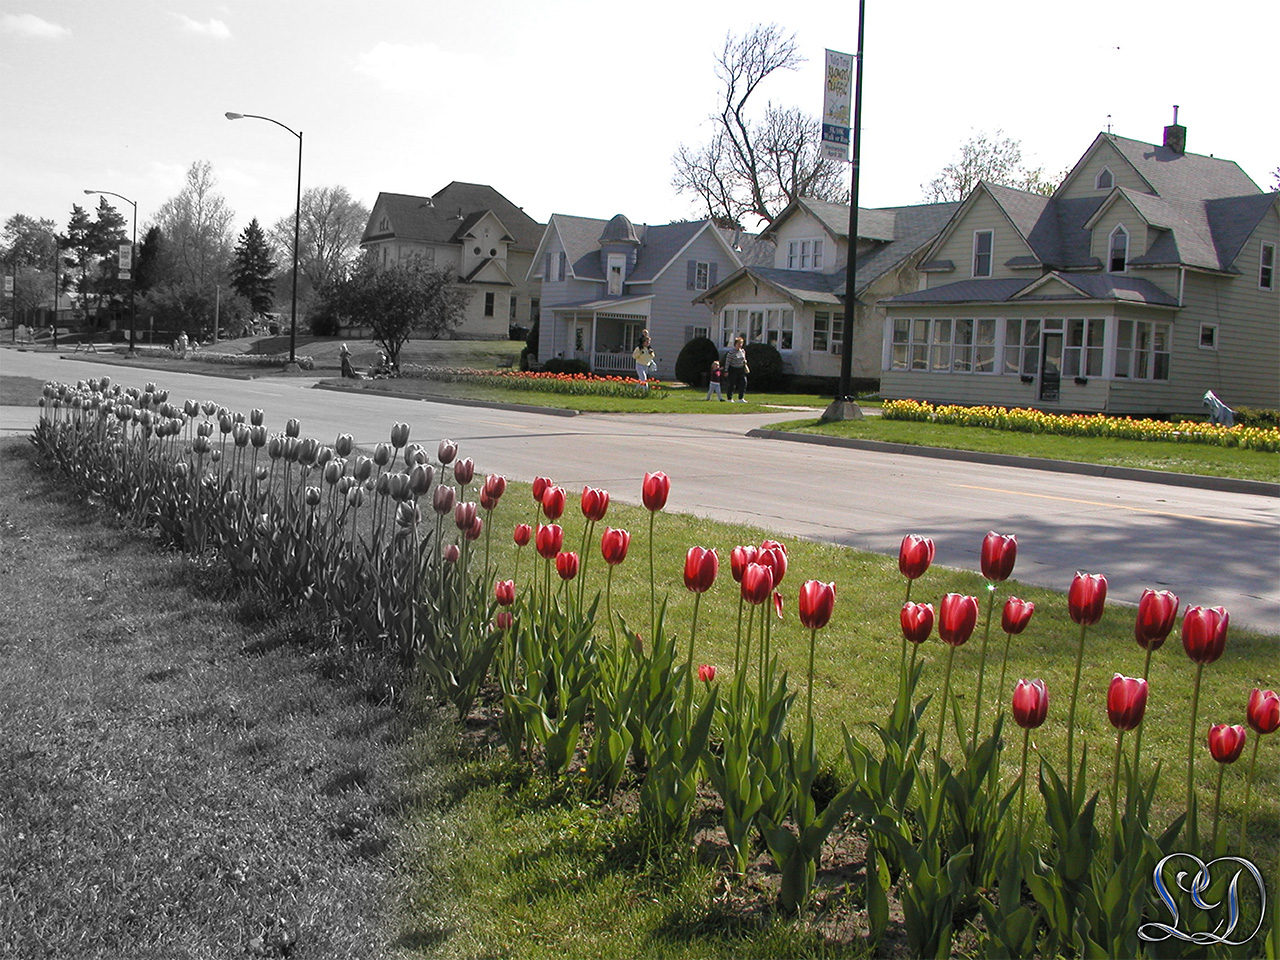 Tulipan festival Pella Iowa Gradient elegant fra sorthvid til farve